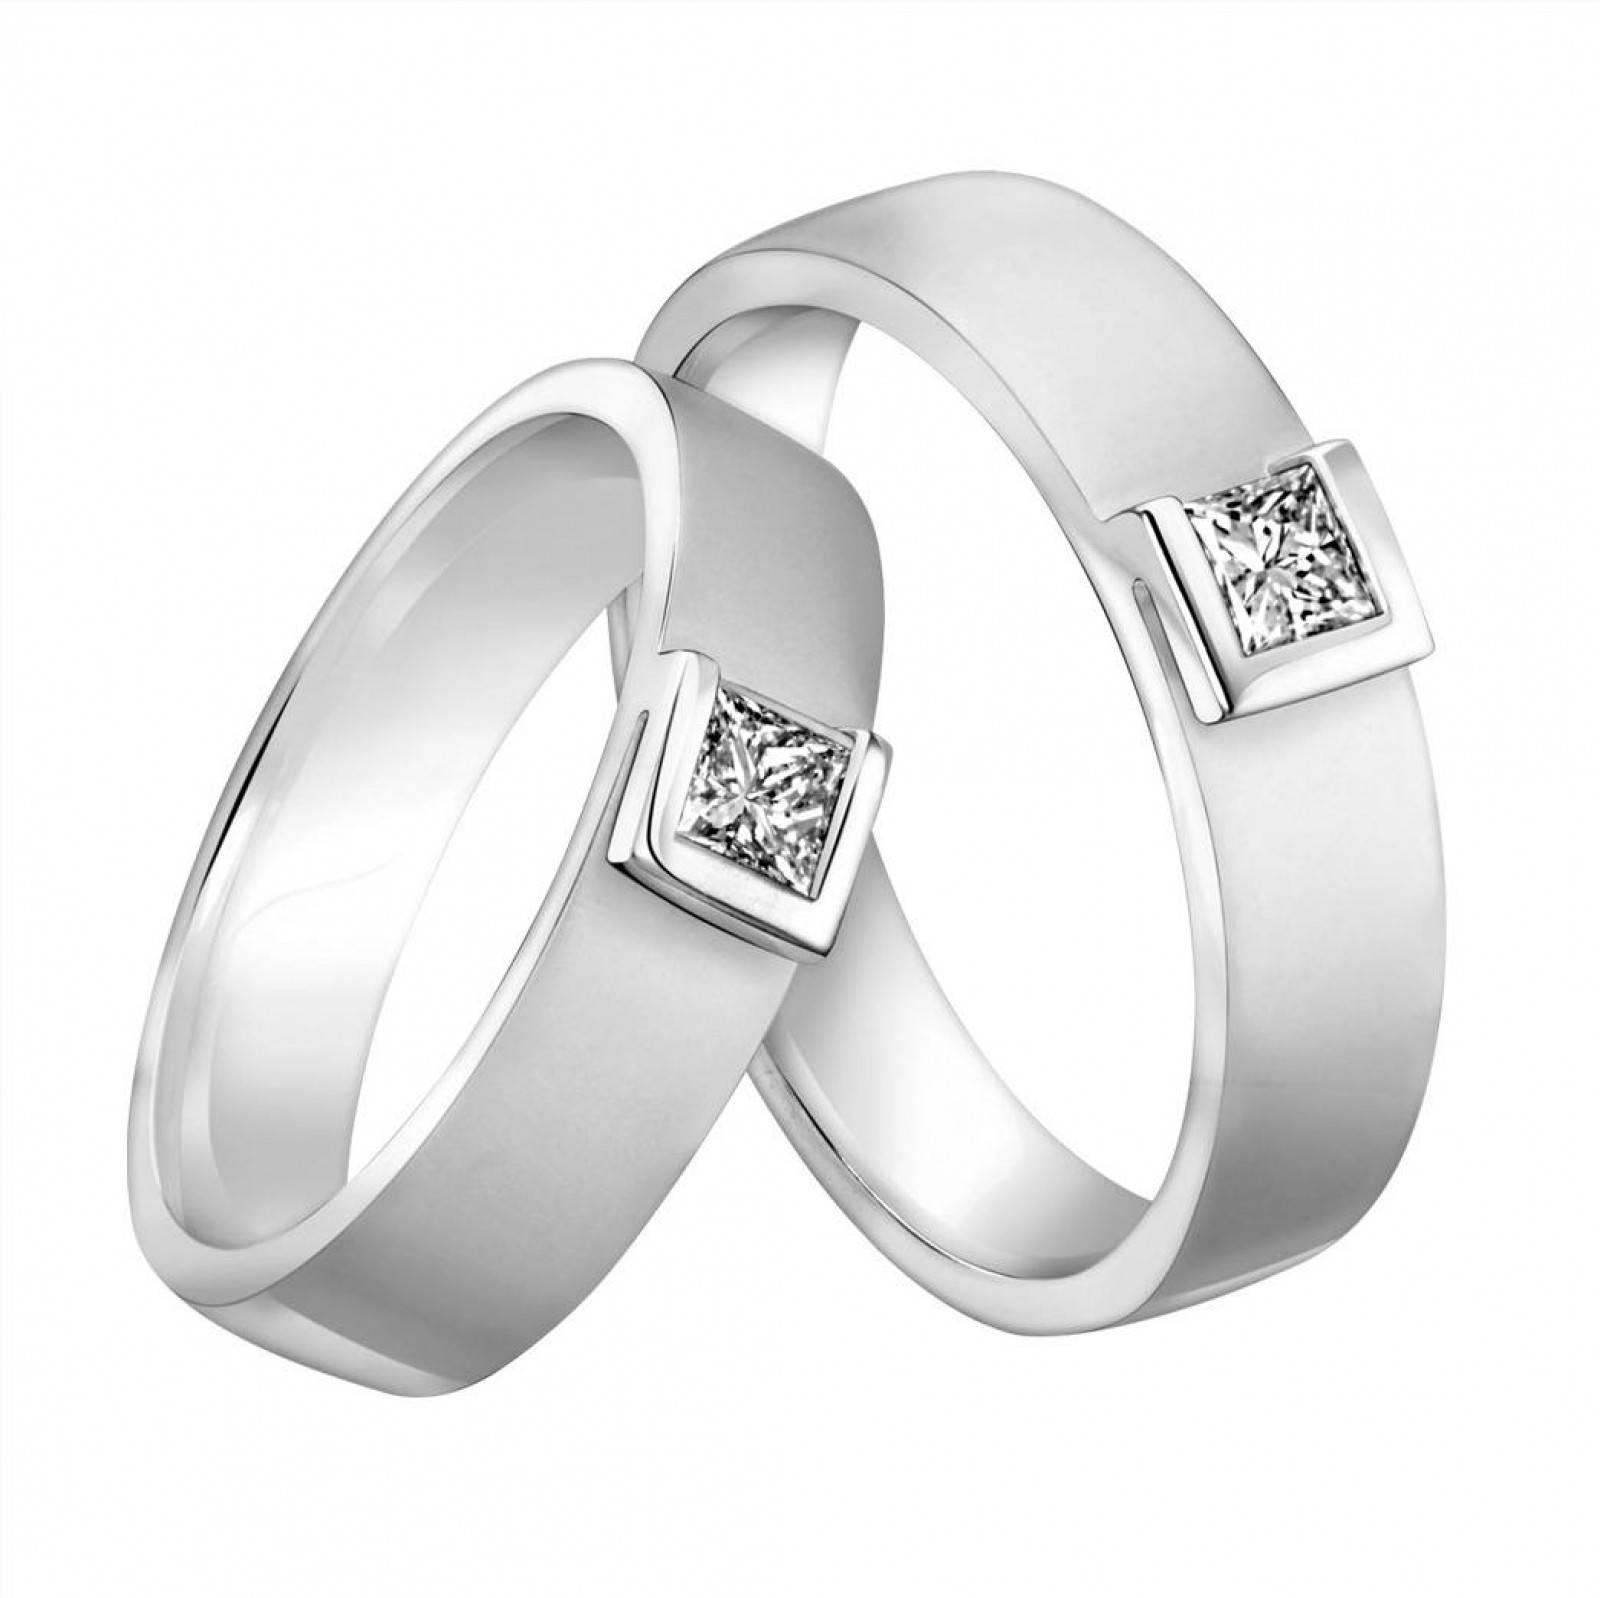 Interlocking Engagement Ring Wedding Band Beautiful Engagement Vs With Current Interlocking Engagement Ring Wedding Bands (View 6 of 15)